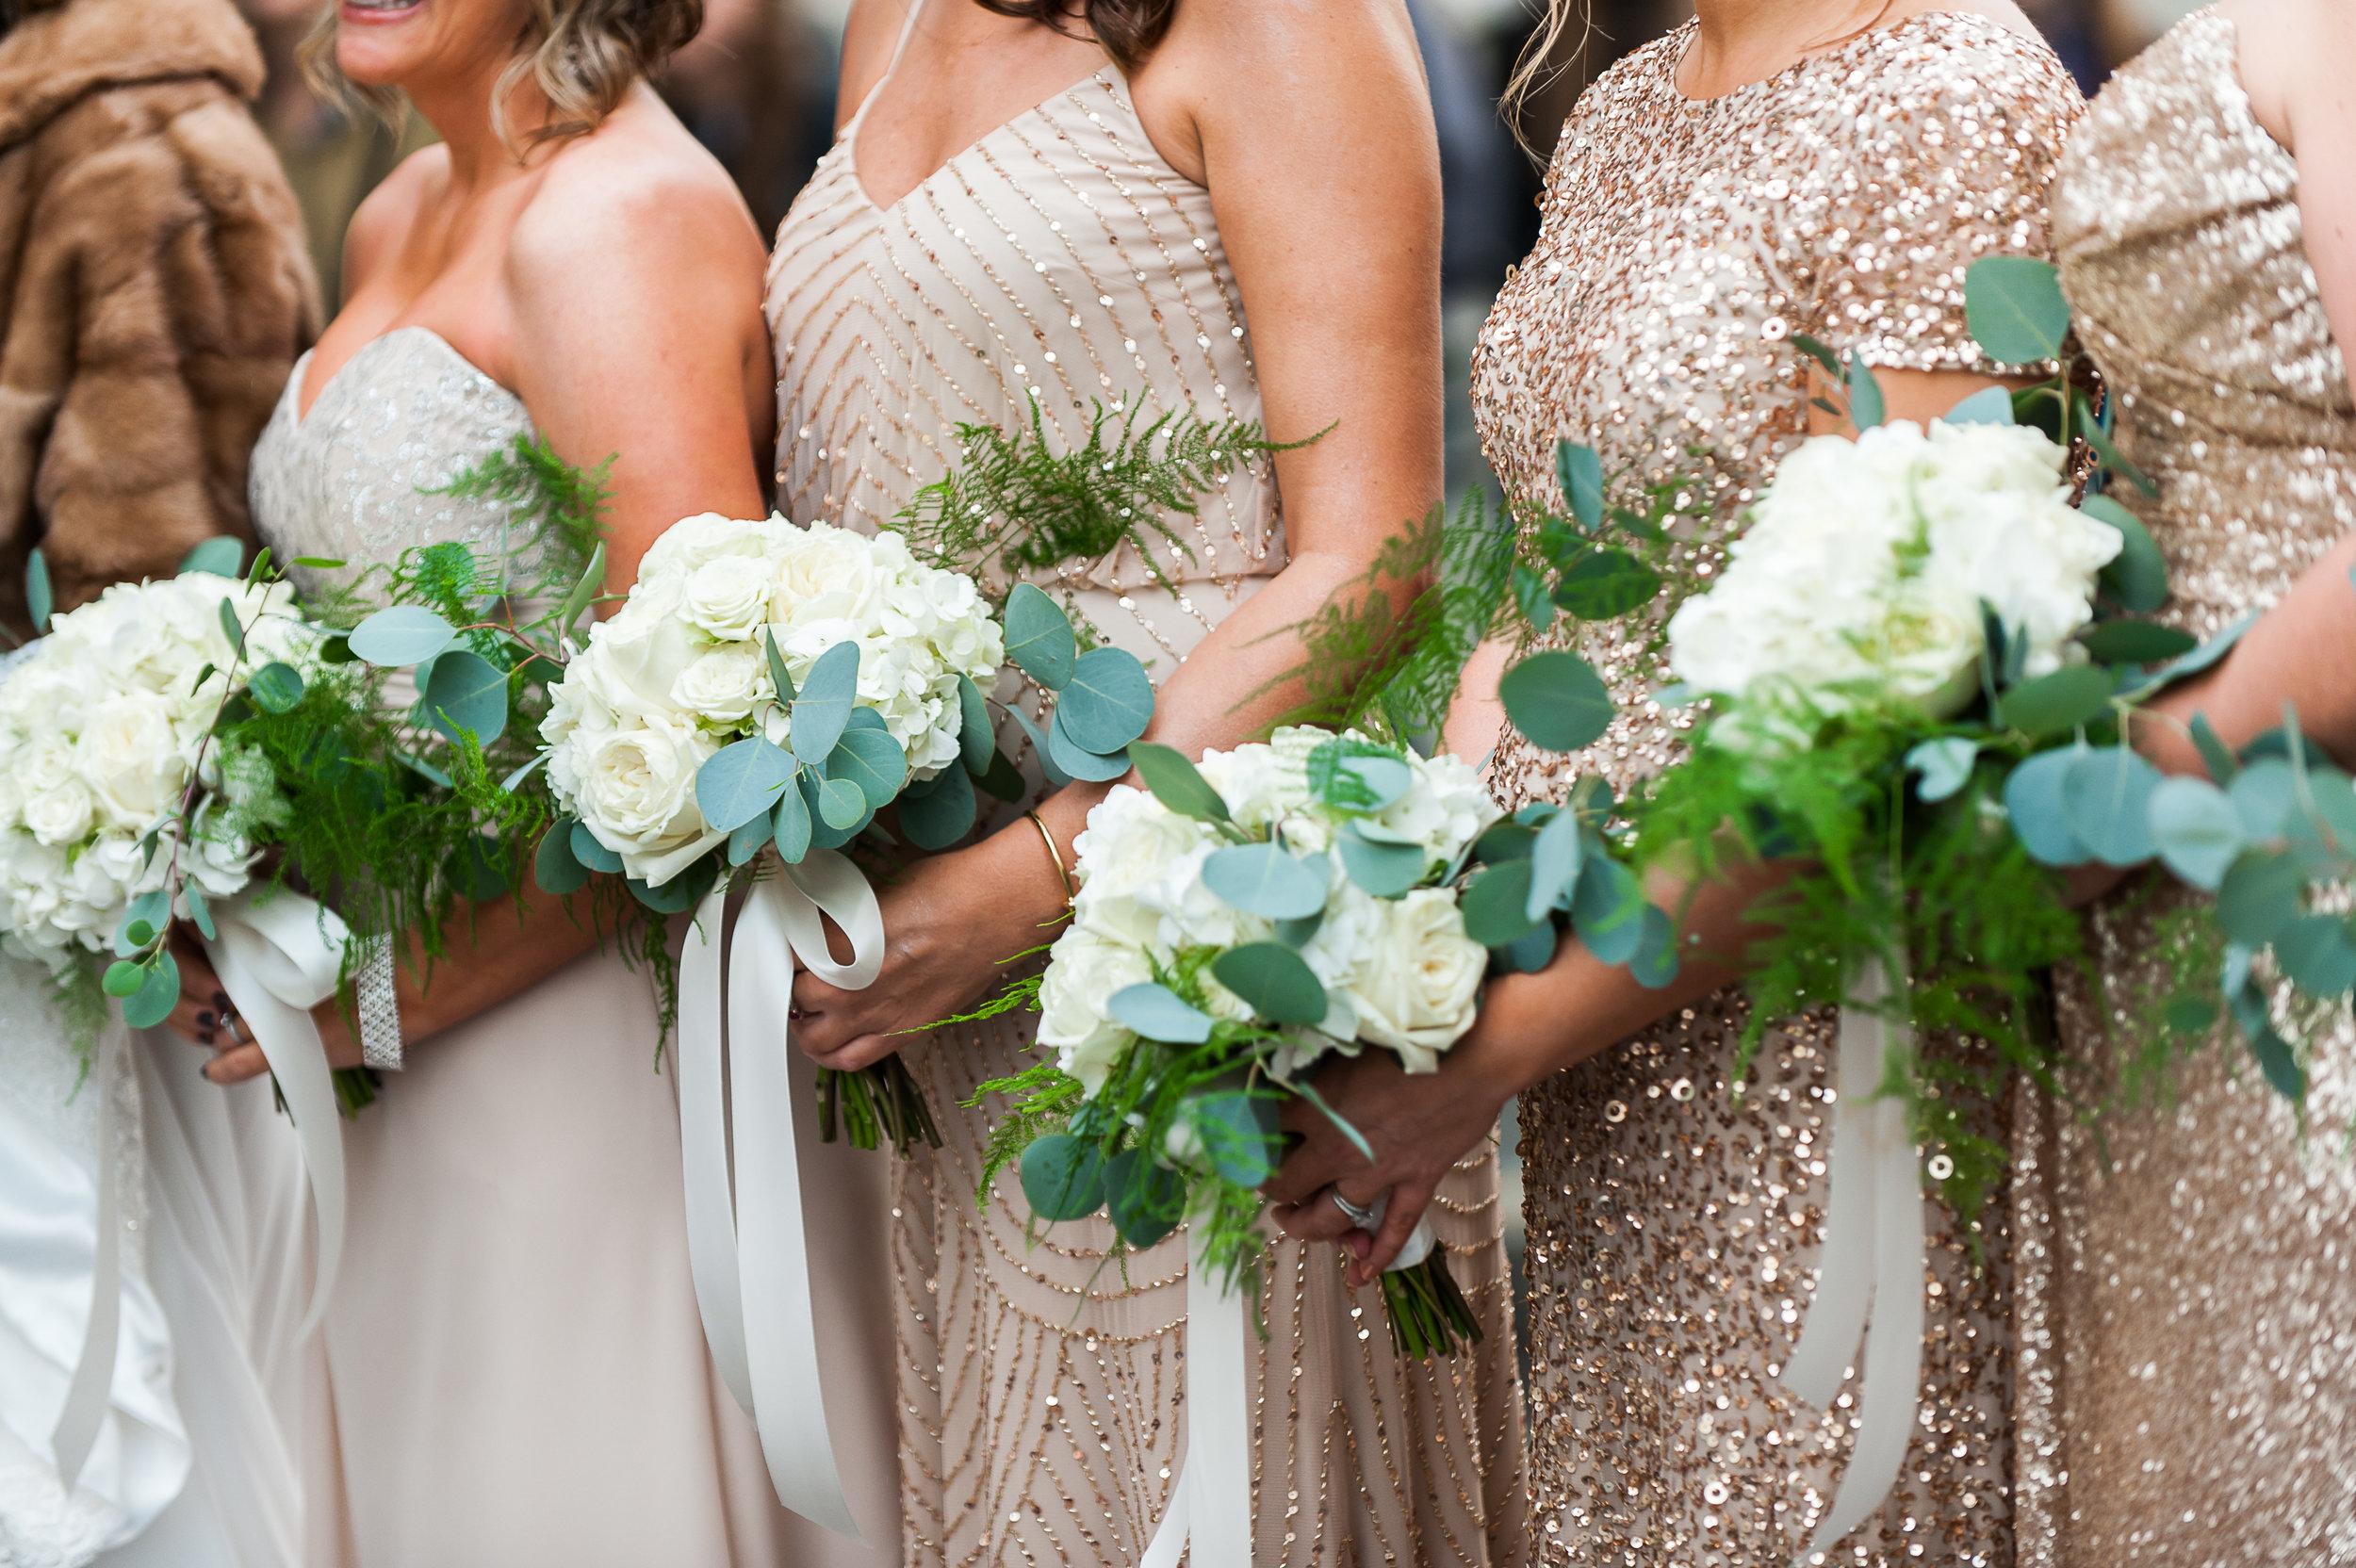 JJ-wedding-Van-Wyhe-Photography-149.jpg